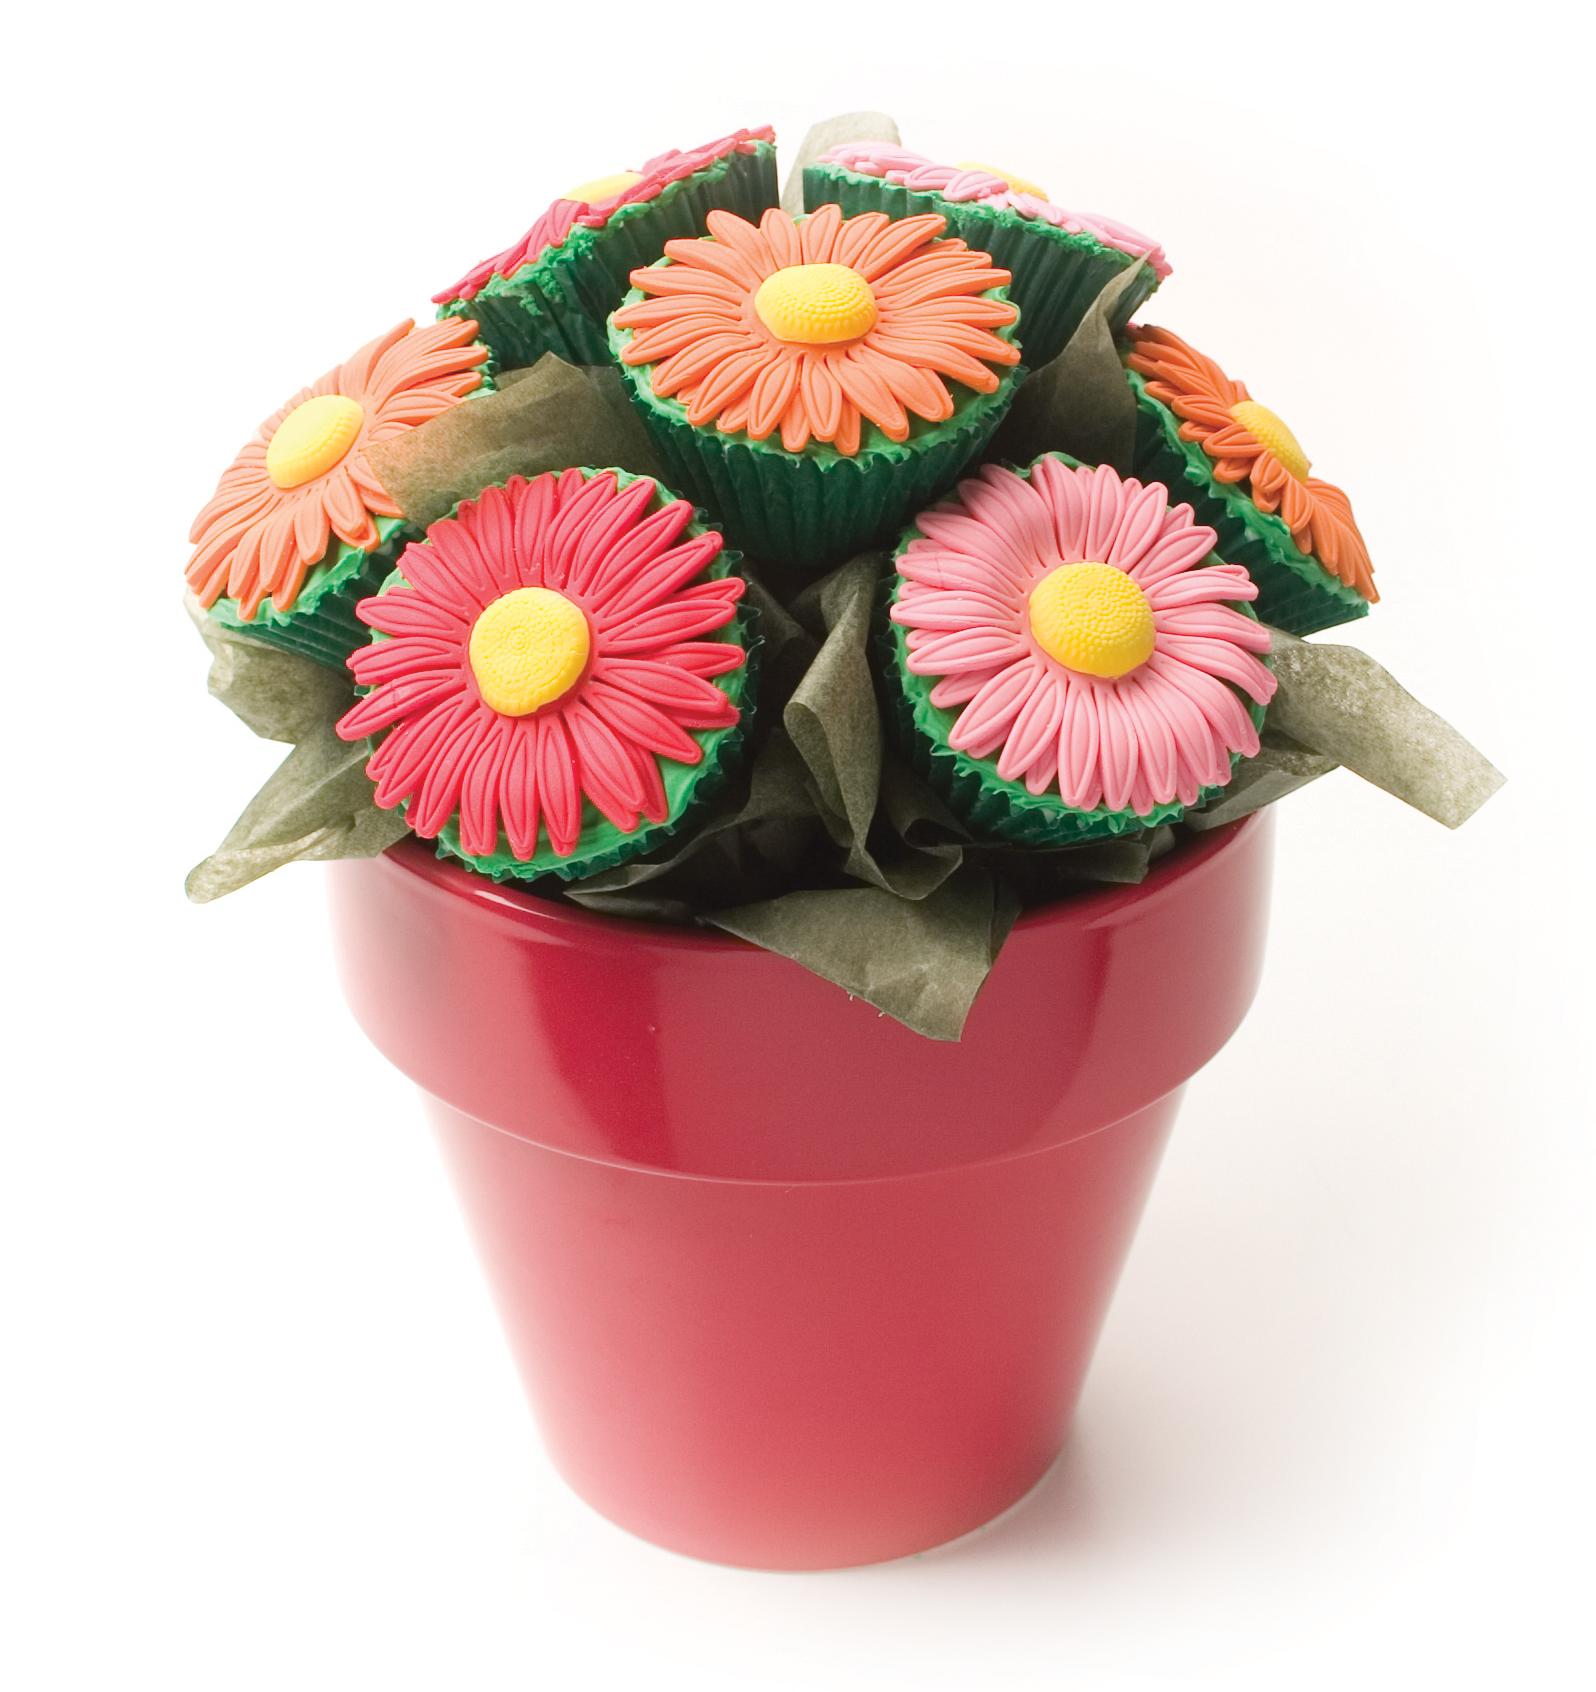 cupcake bouquet | Autumn Carpenter\'s Weblog